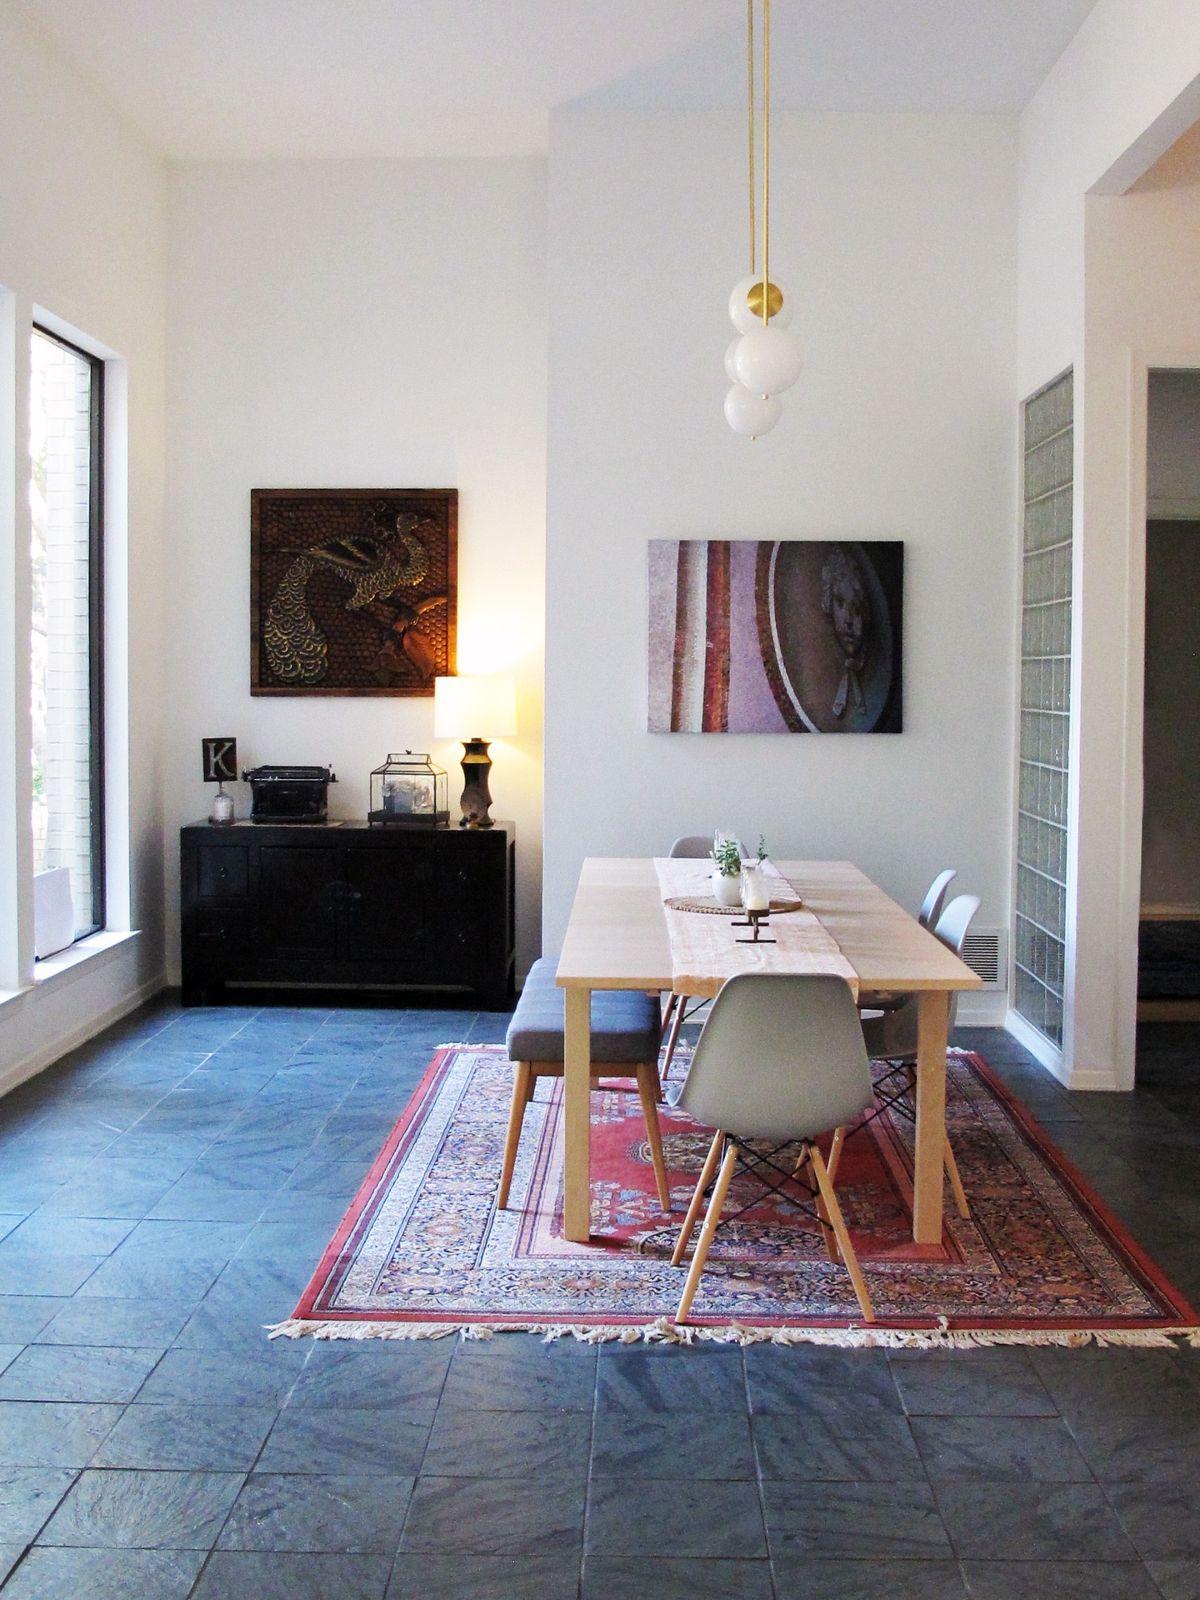 Kirkpatrick Contemporary Home Photo Video Shoot Location Dallas 04.jpg